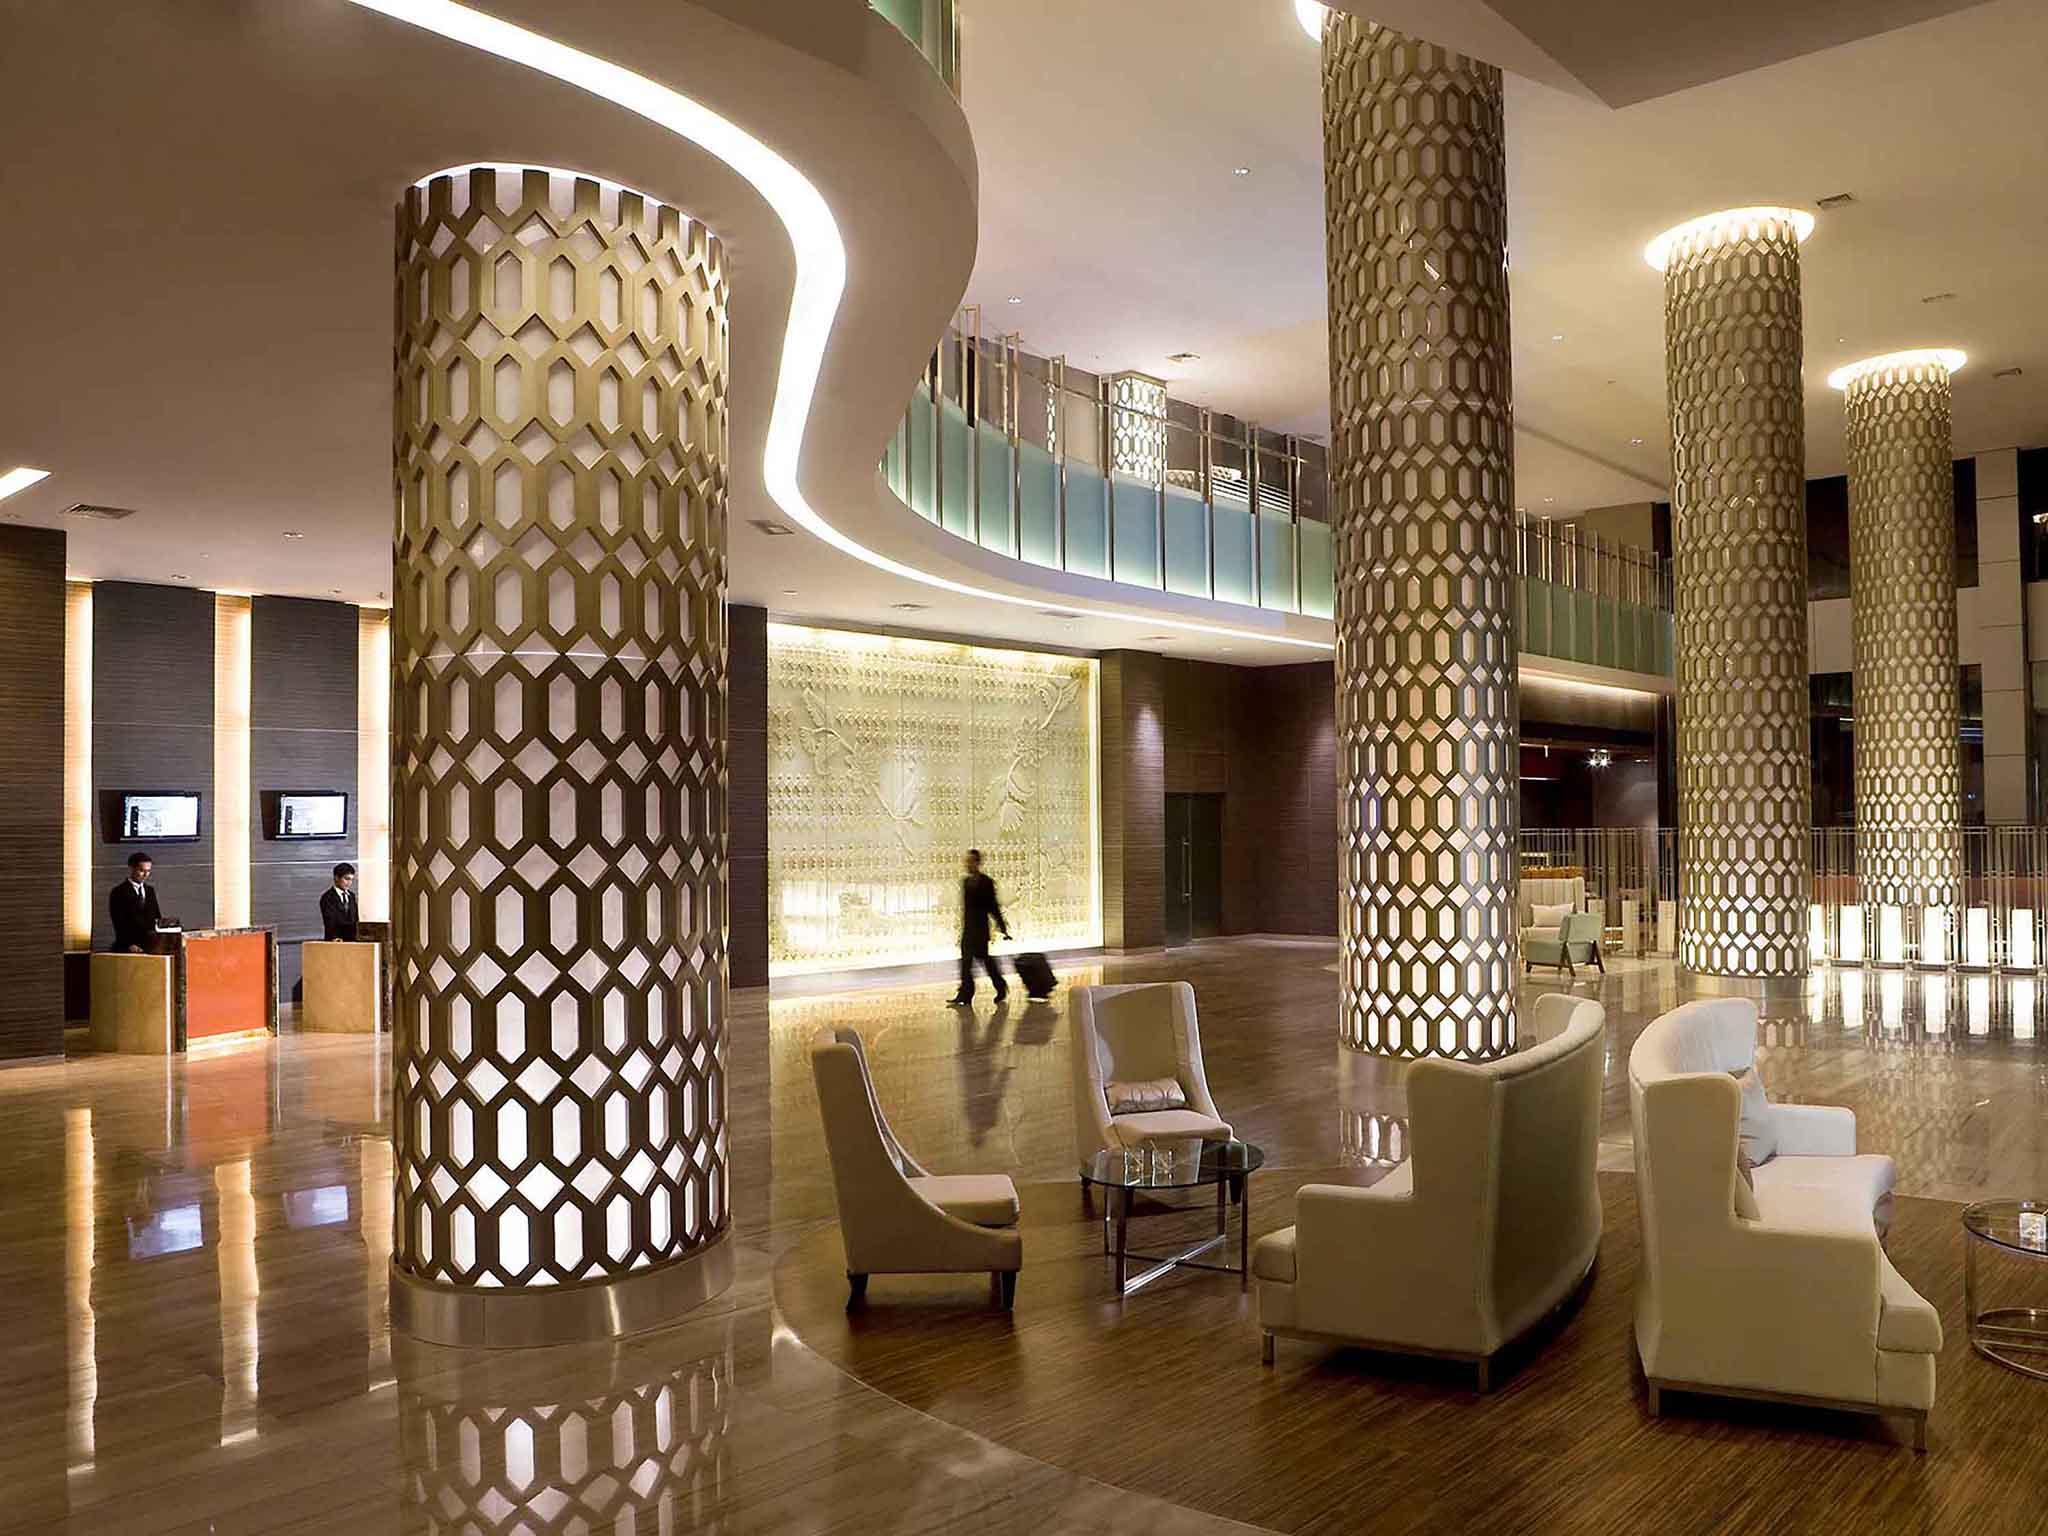 Otel – Novotel Bangka - Hotel & Convention Centre